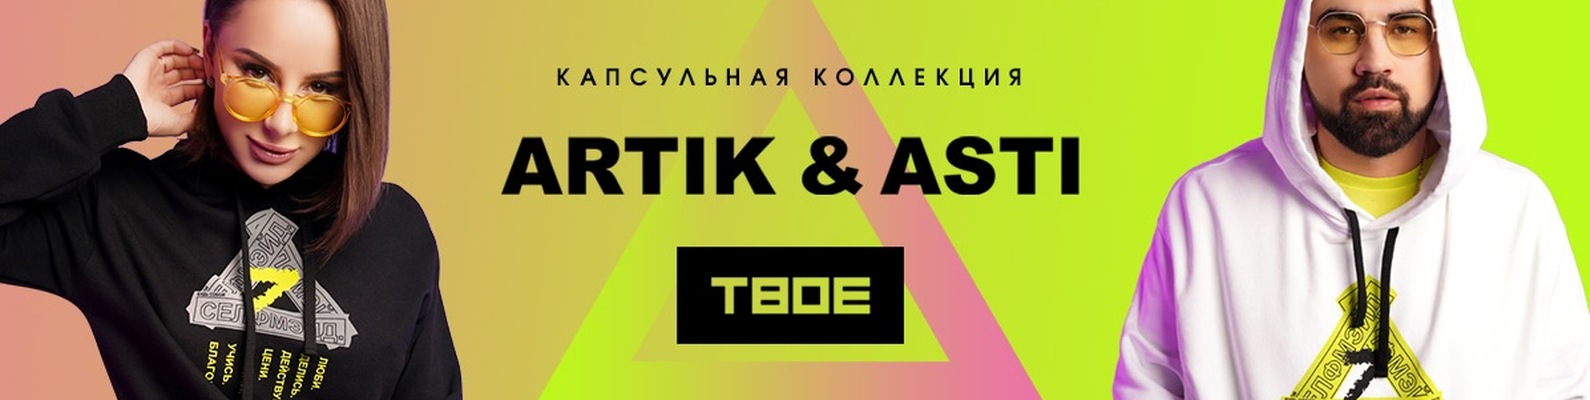 9215bd25a1fe ТВОЕ   ВКонтакте